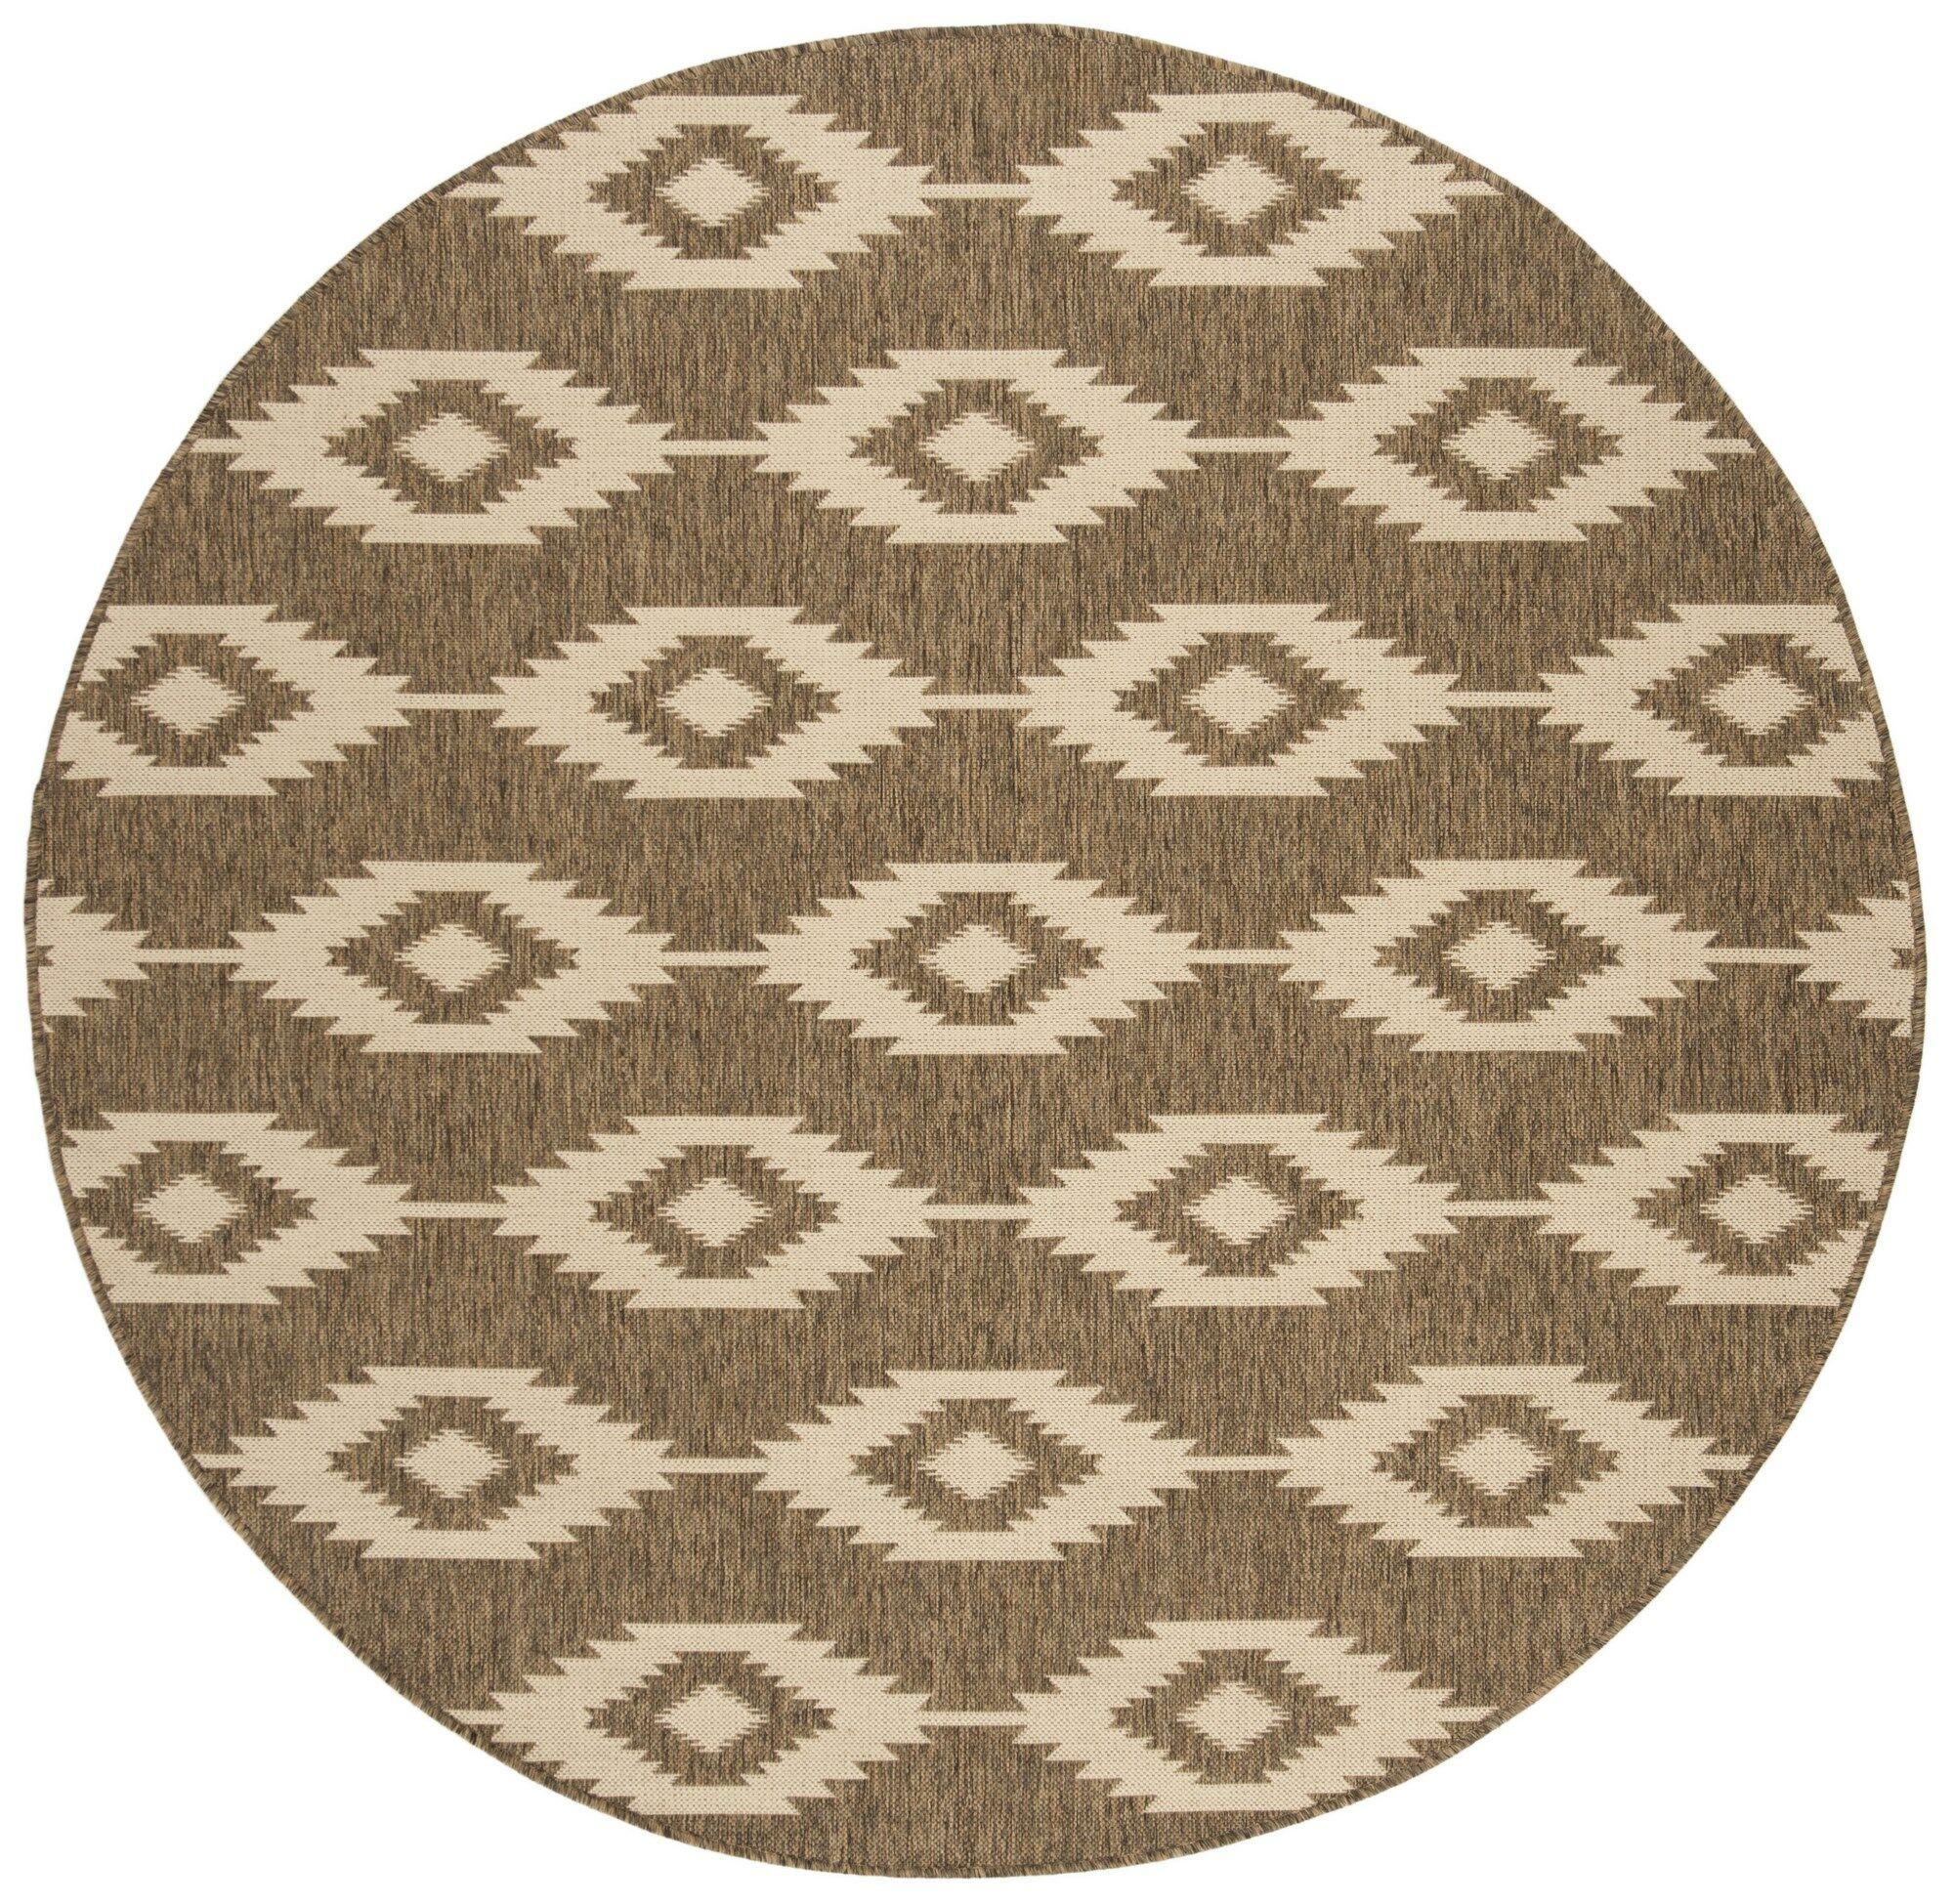 Lollar Cream/Beige Area Rug Rug Size: Round 6'7